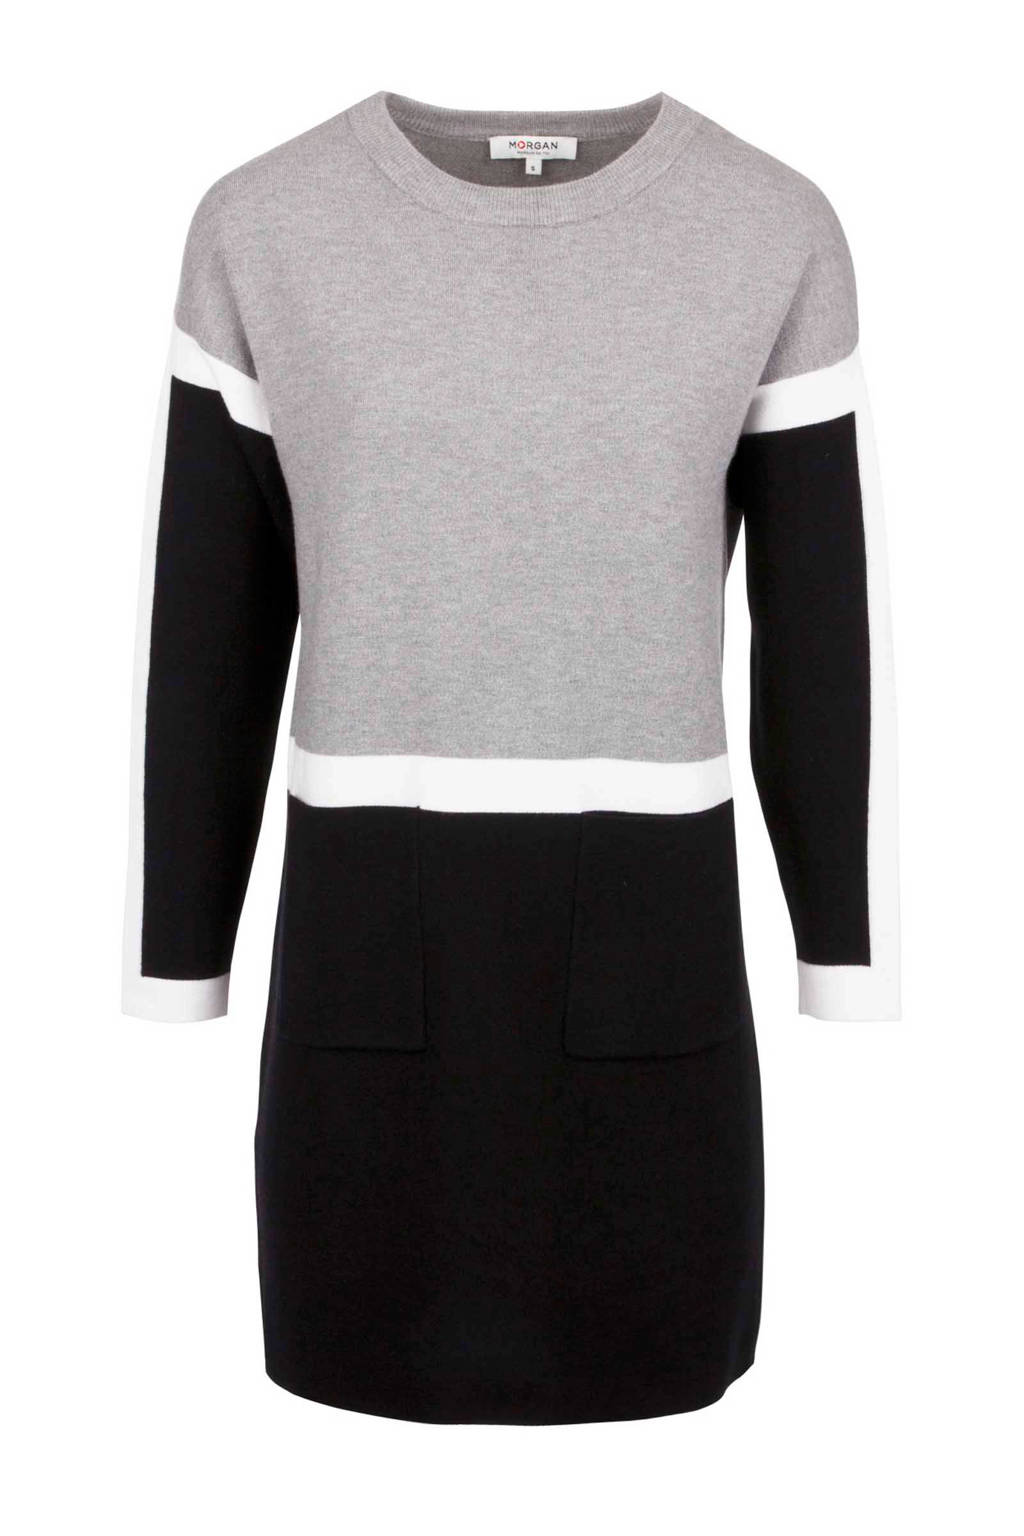 Morgan jurk, Grijs/zwart/wit